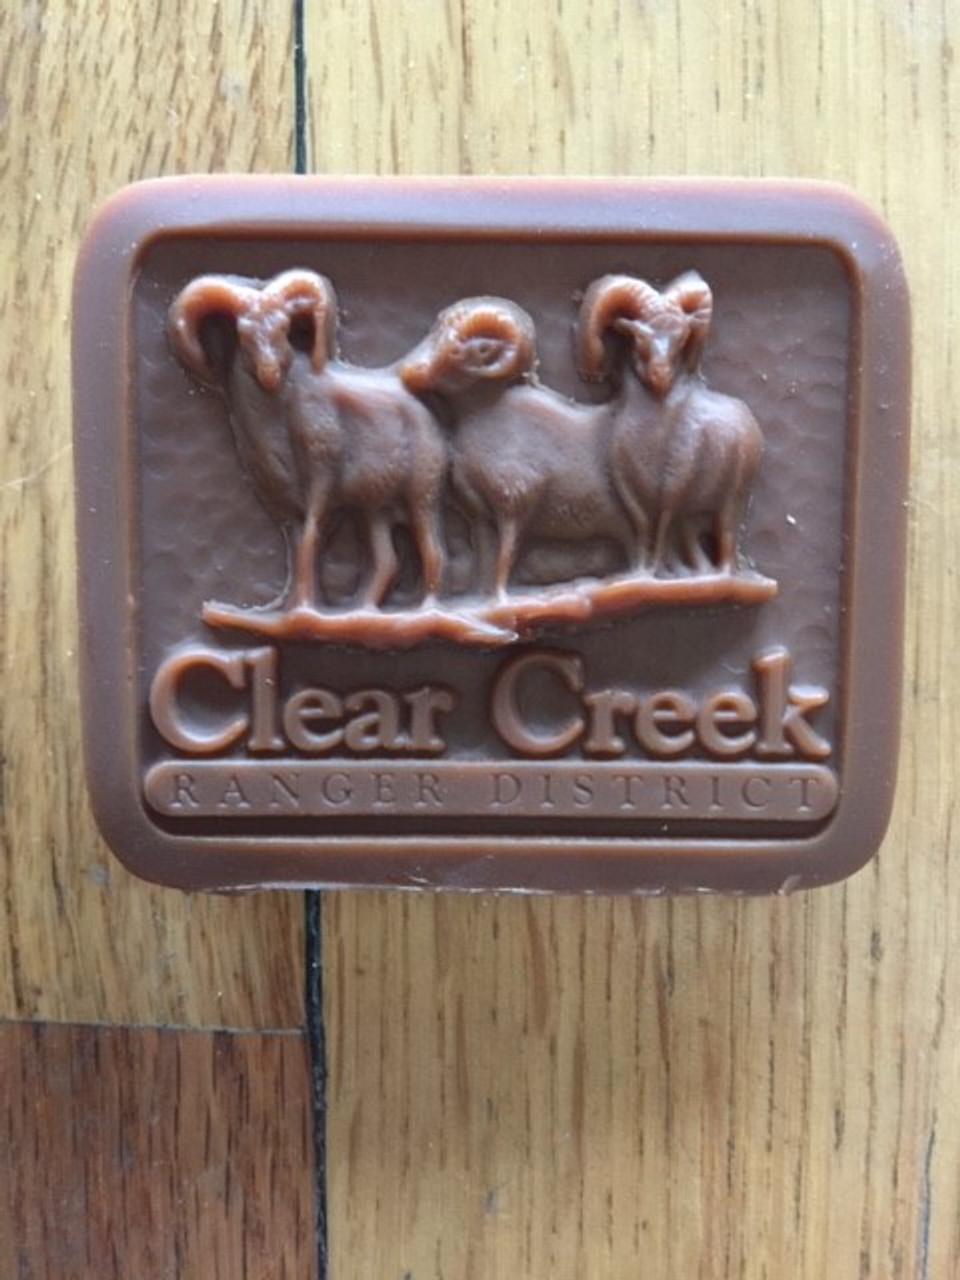 Clear Creek Ranger District Buckle